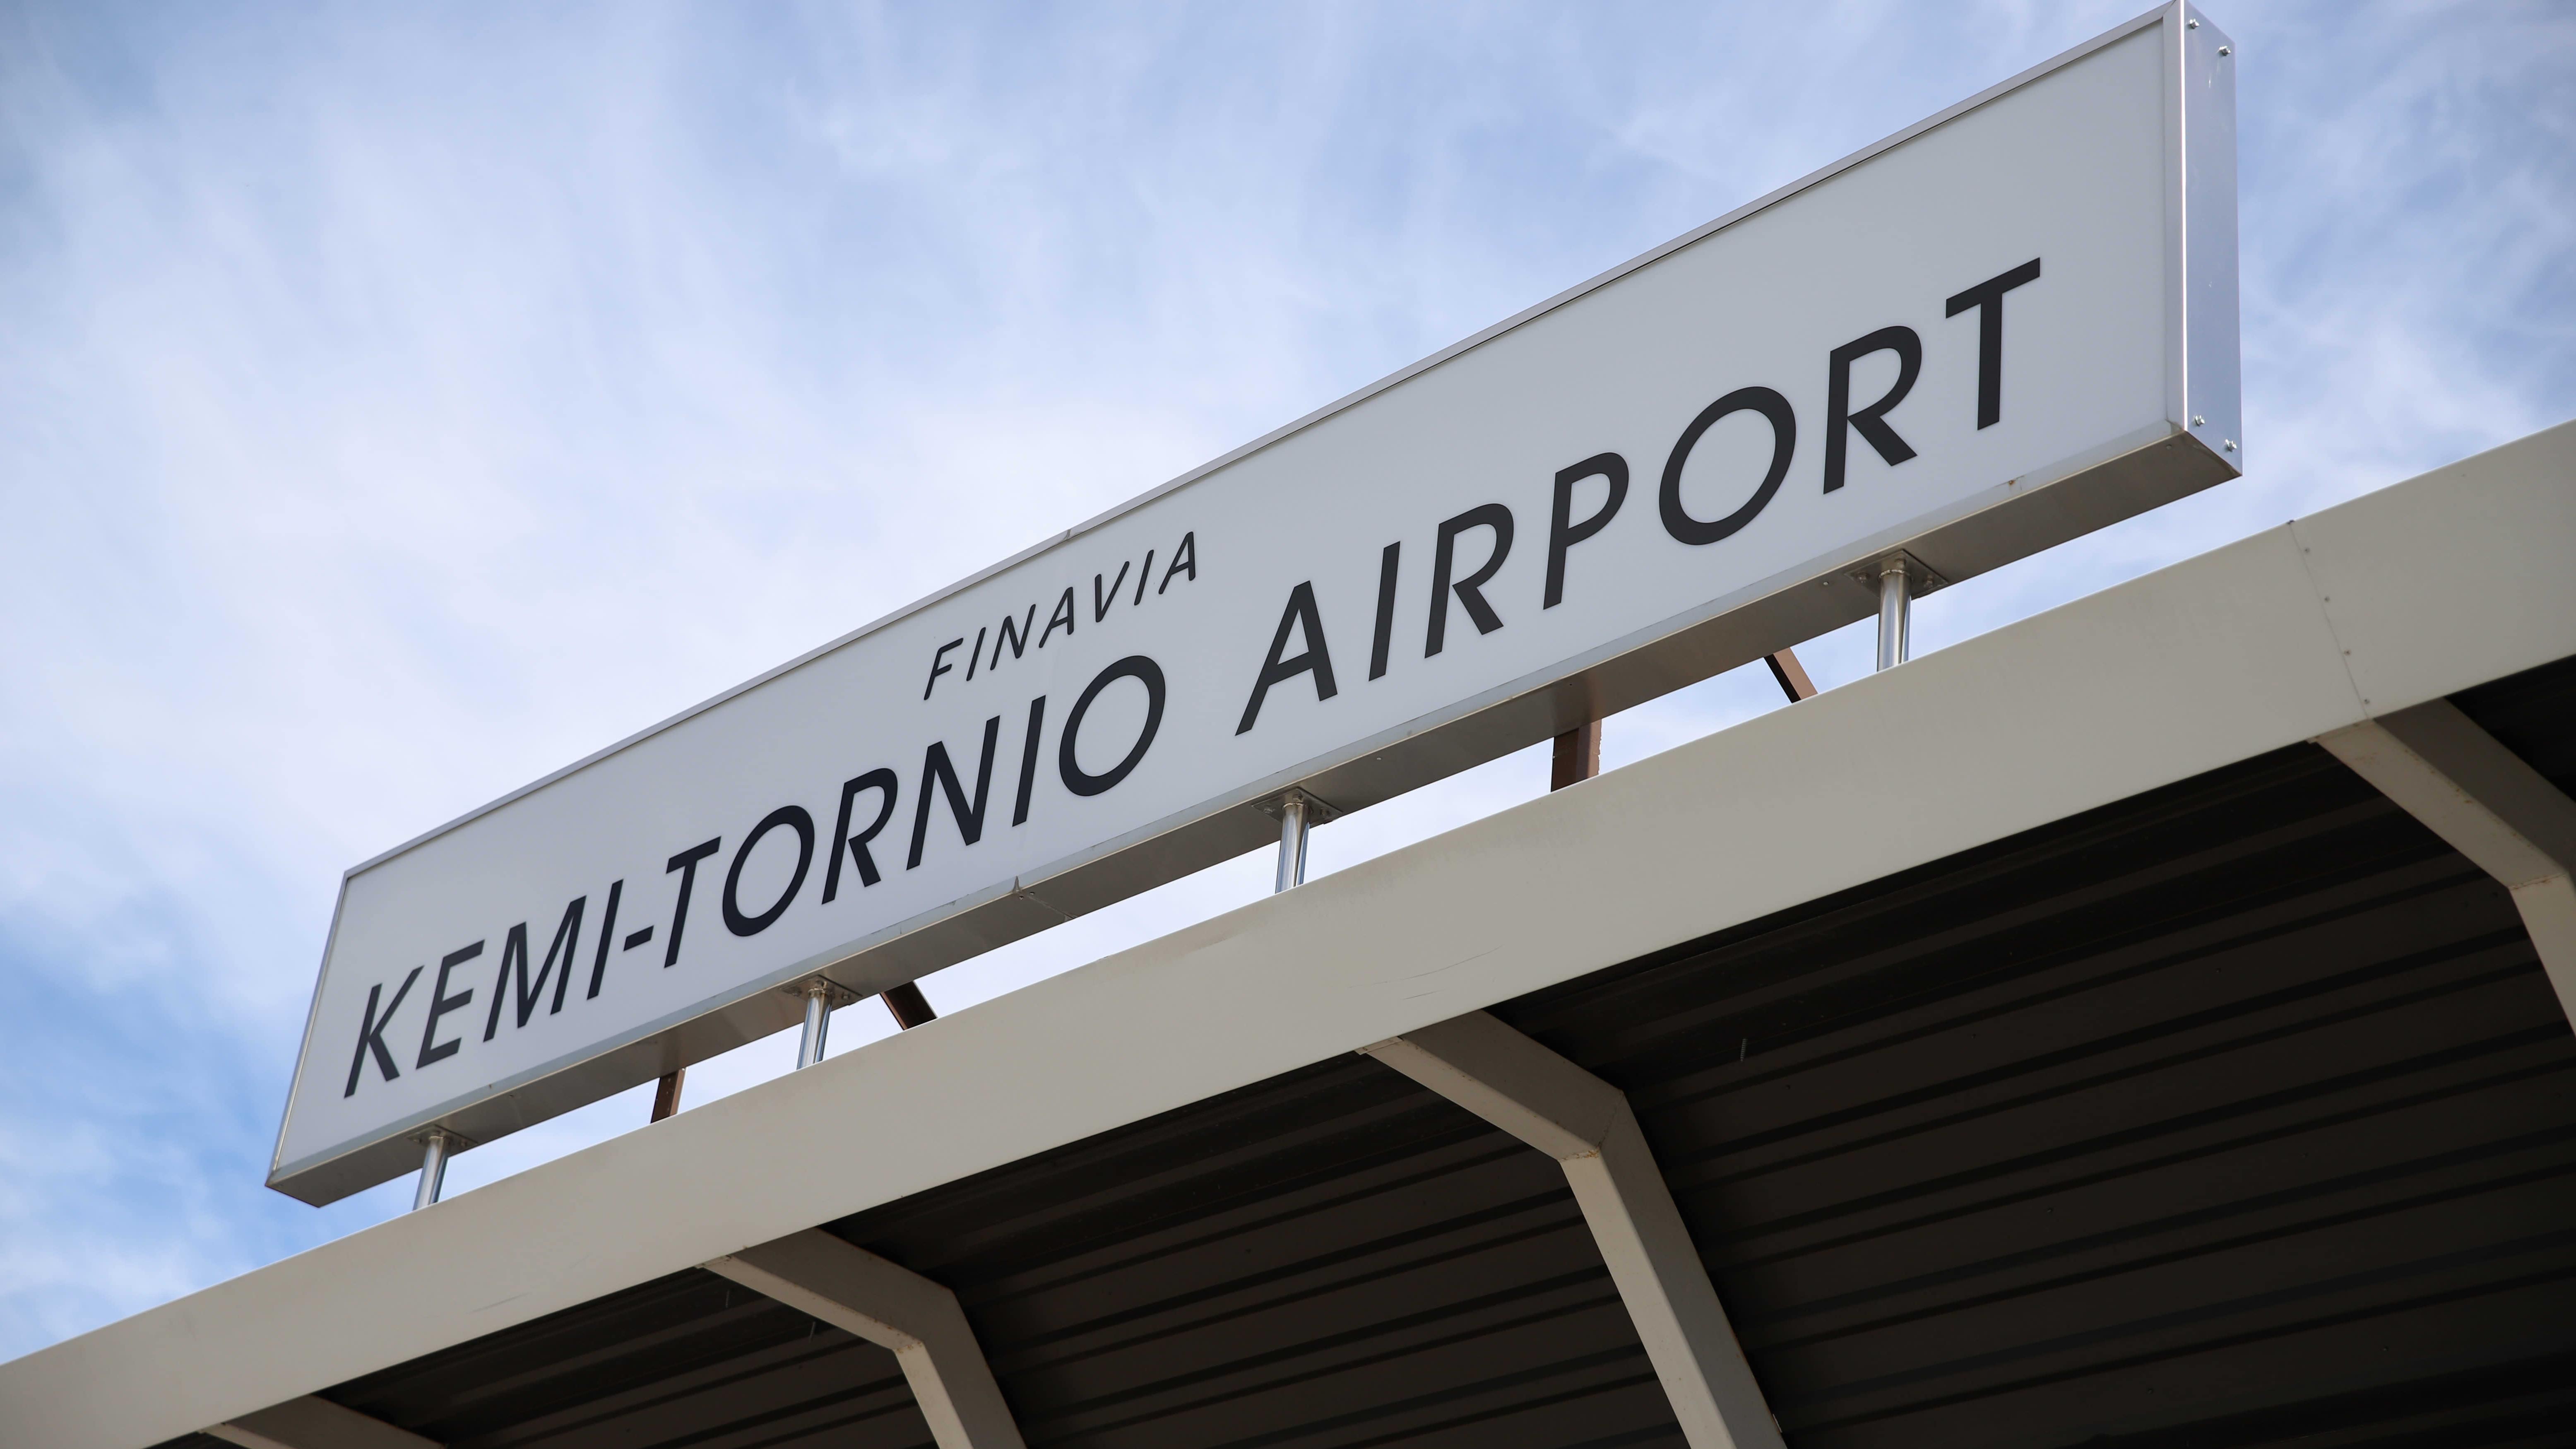 Suljettu Kemi-Tornion lentoasema